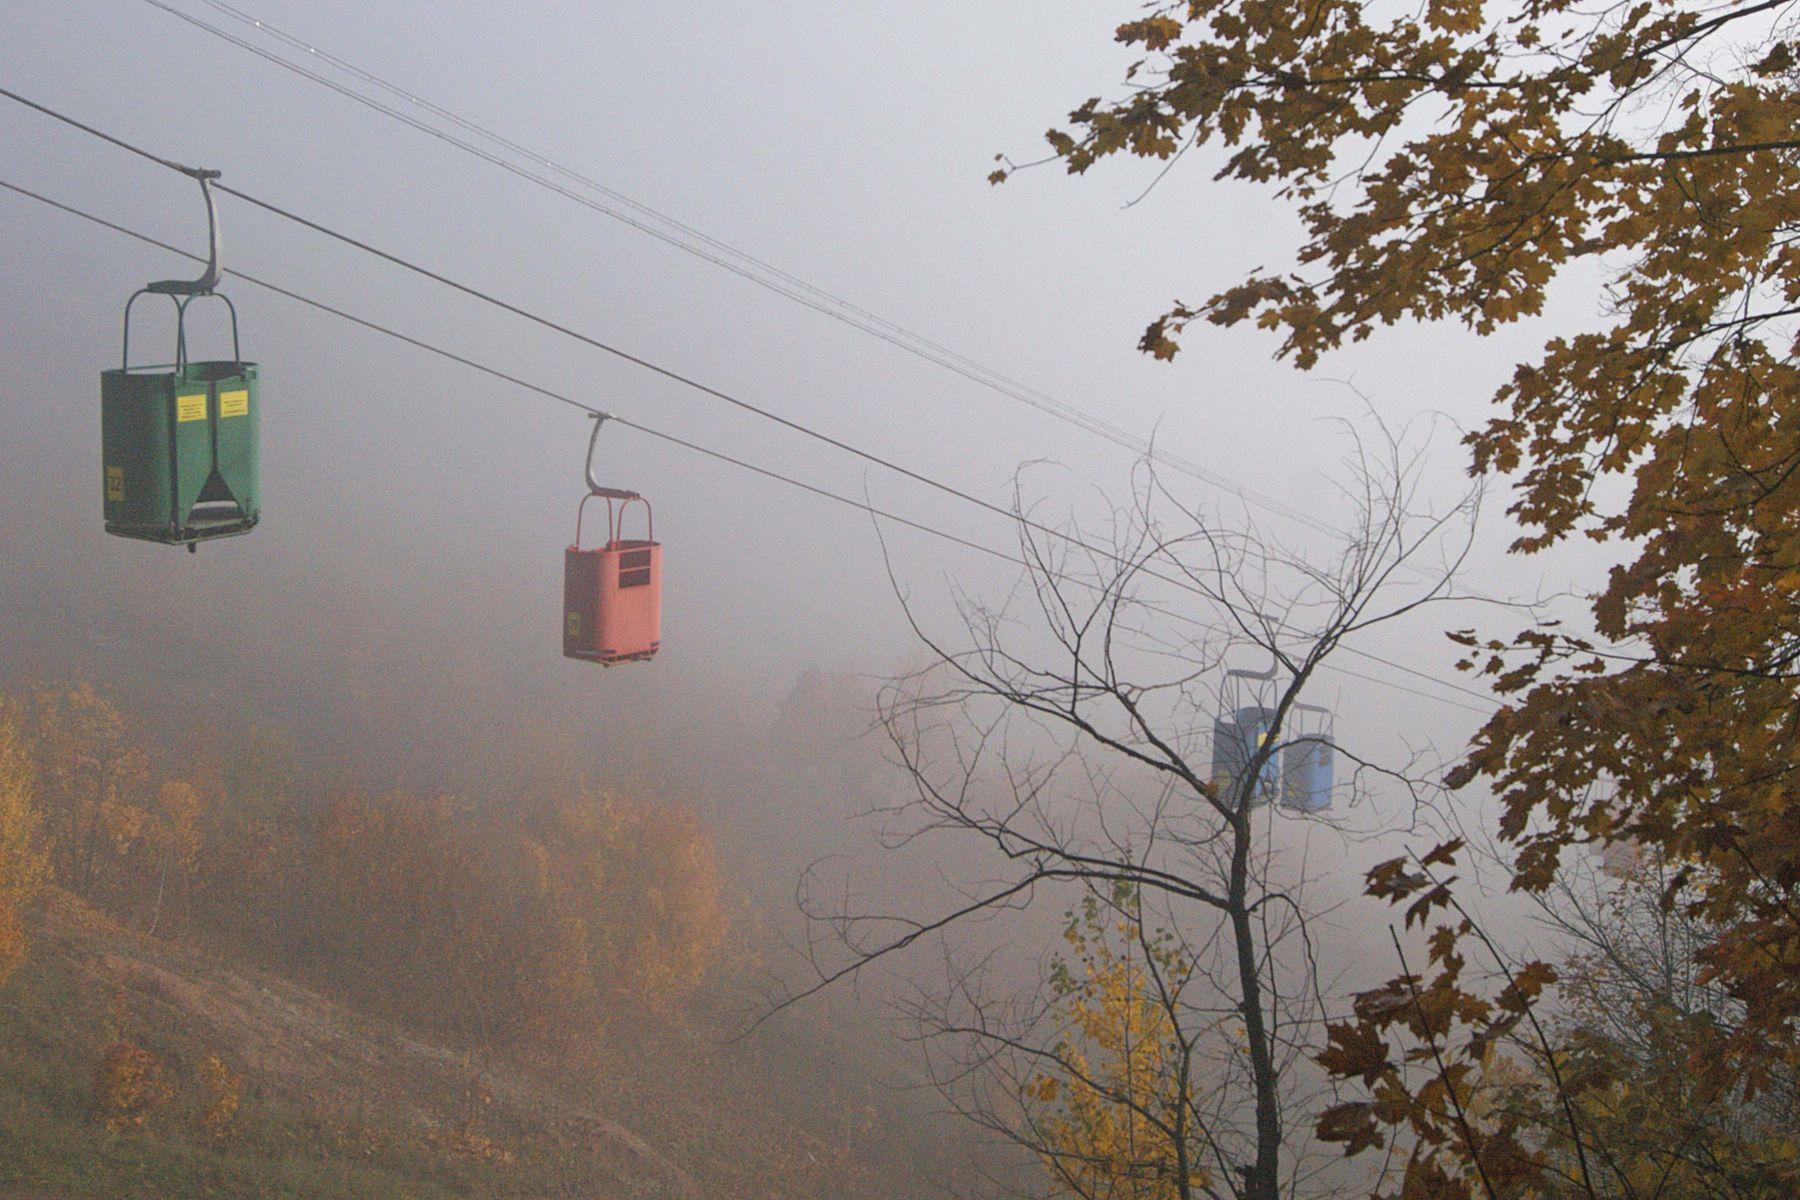 Осенняя карусель осень туман канатная дорога фуникулёр подъемник